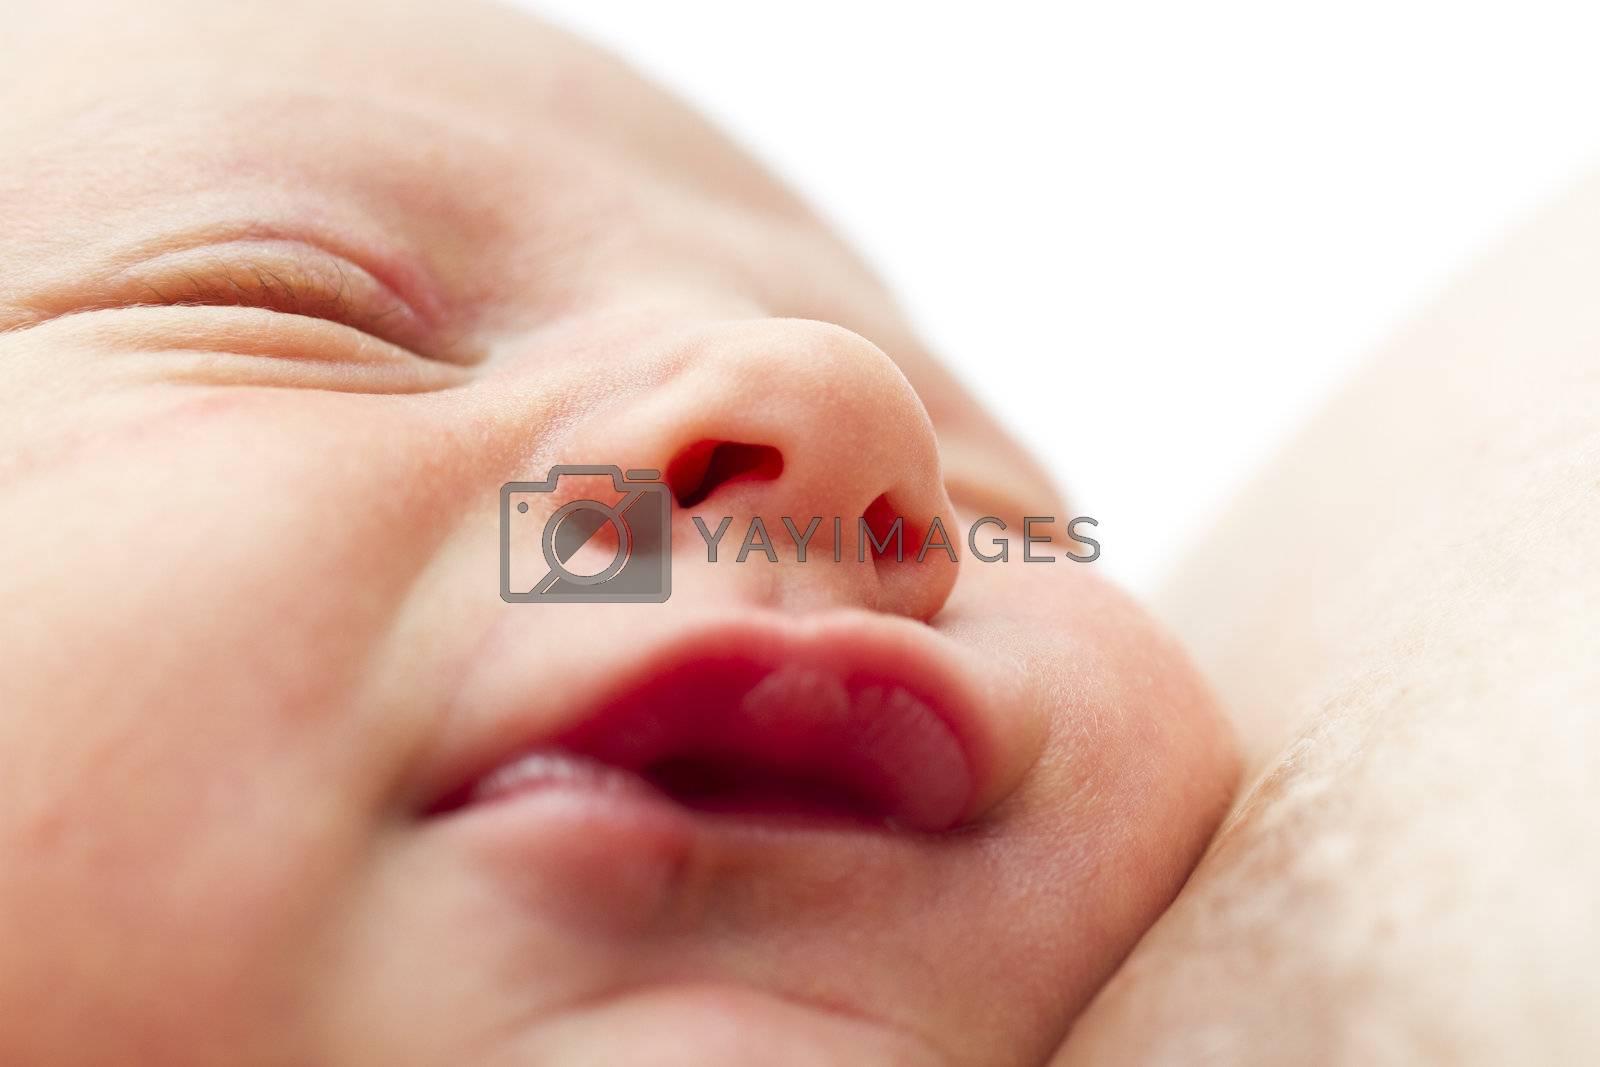 nursling in close up shot. eyes closed, sleeping